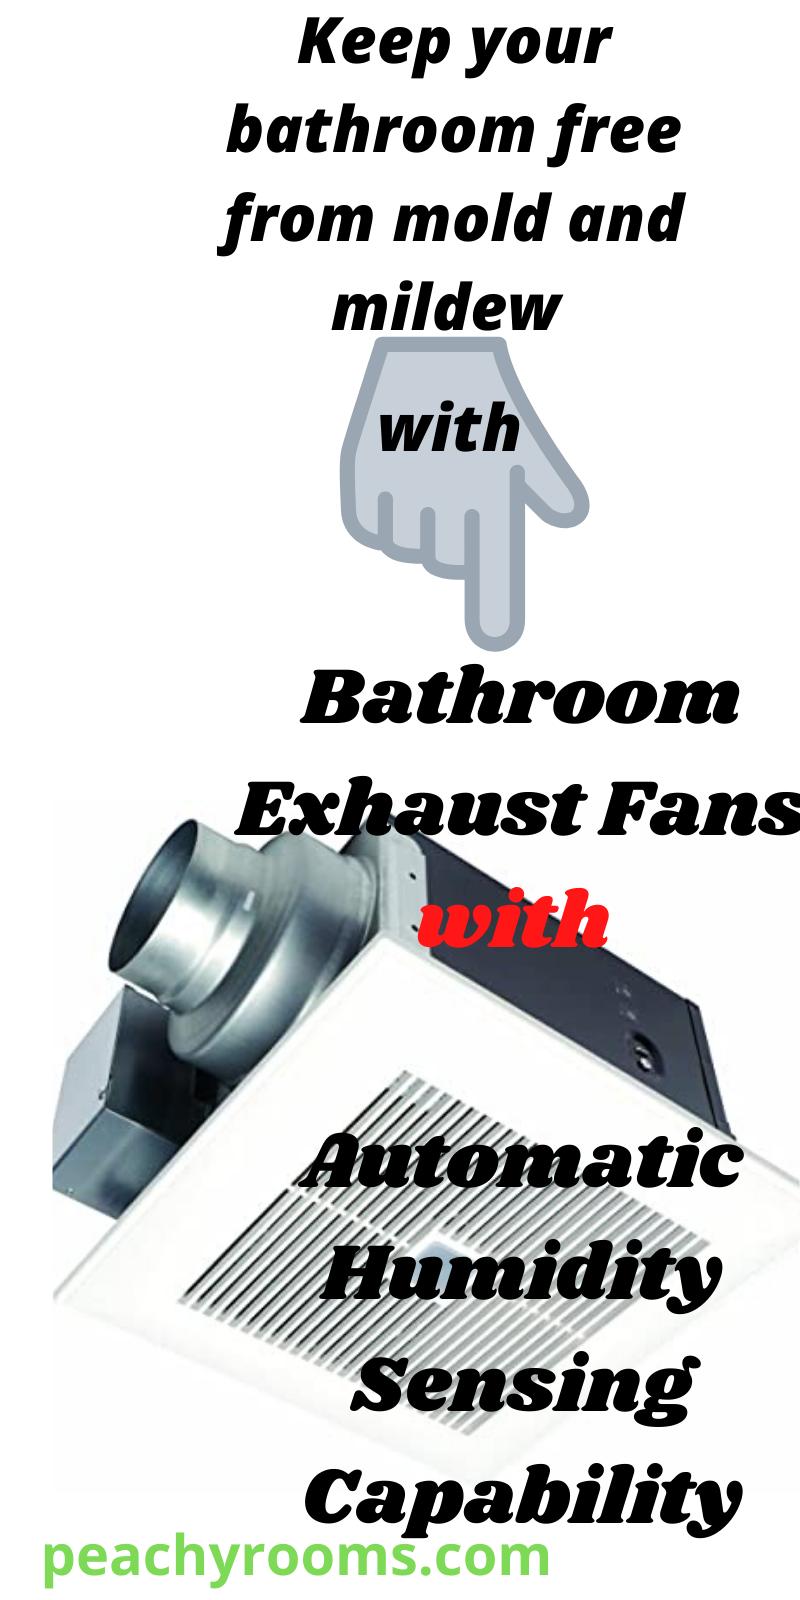 Bathroom Exhaust Fans With Humidity Sensors Worth The Money Bathroom Exhaust Fan Bathroom Exhaust Exhaust Fan